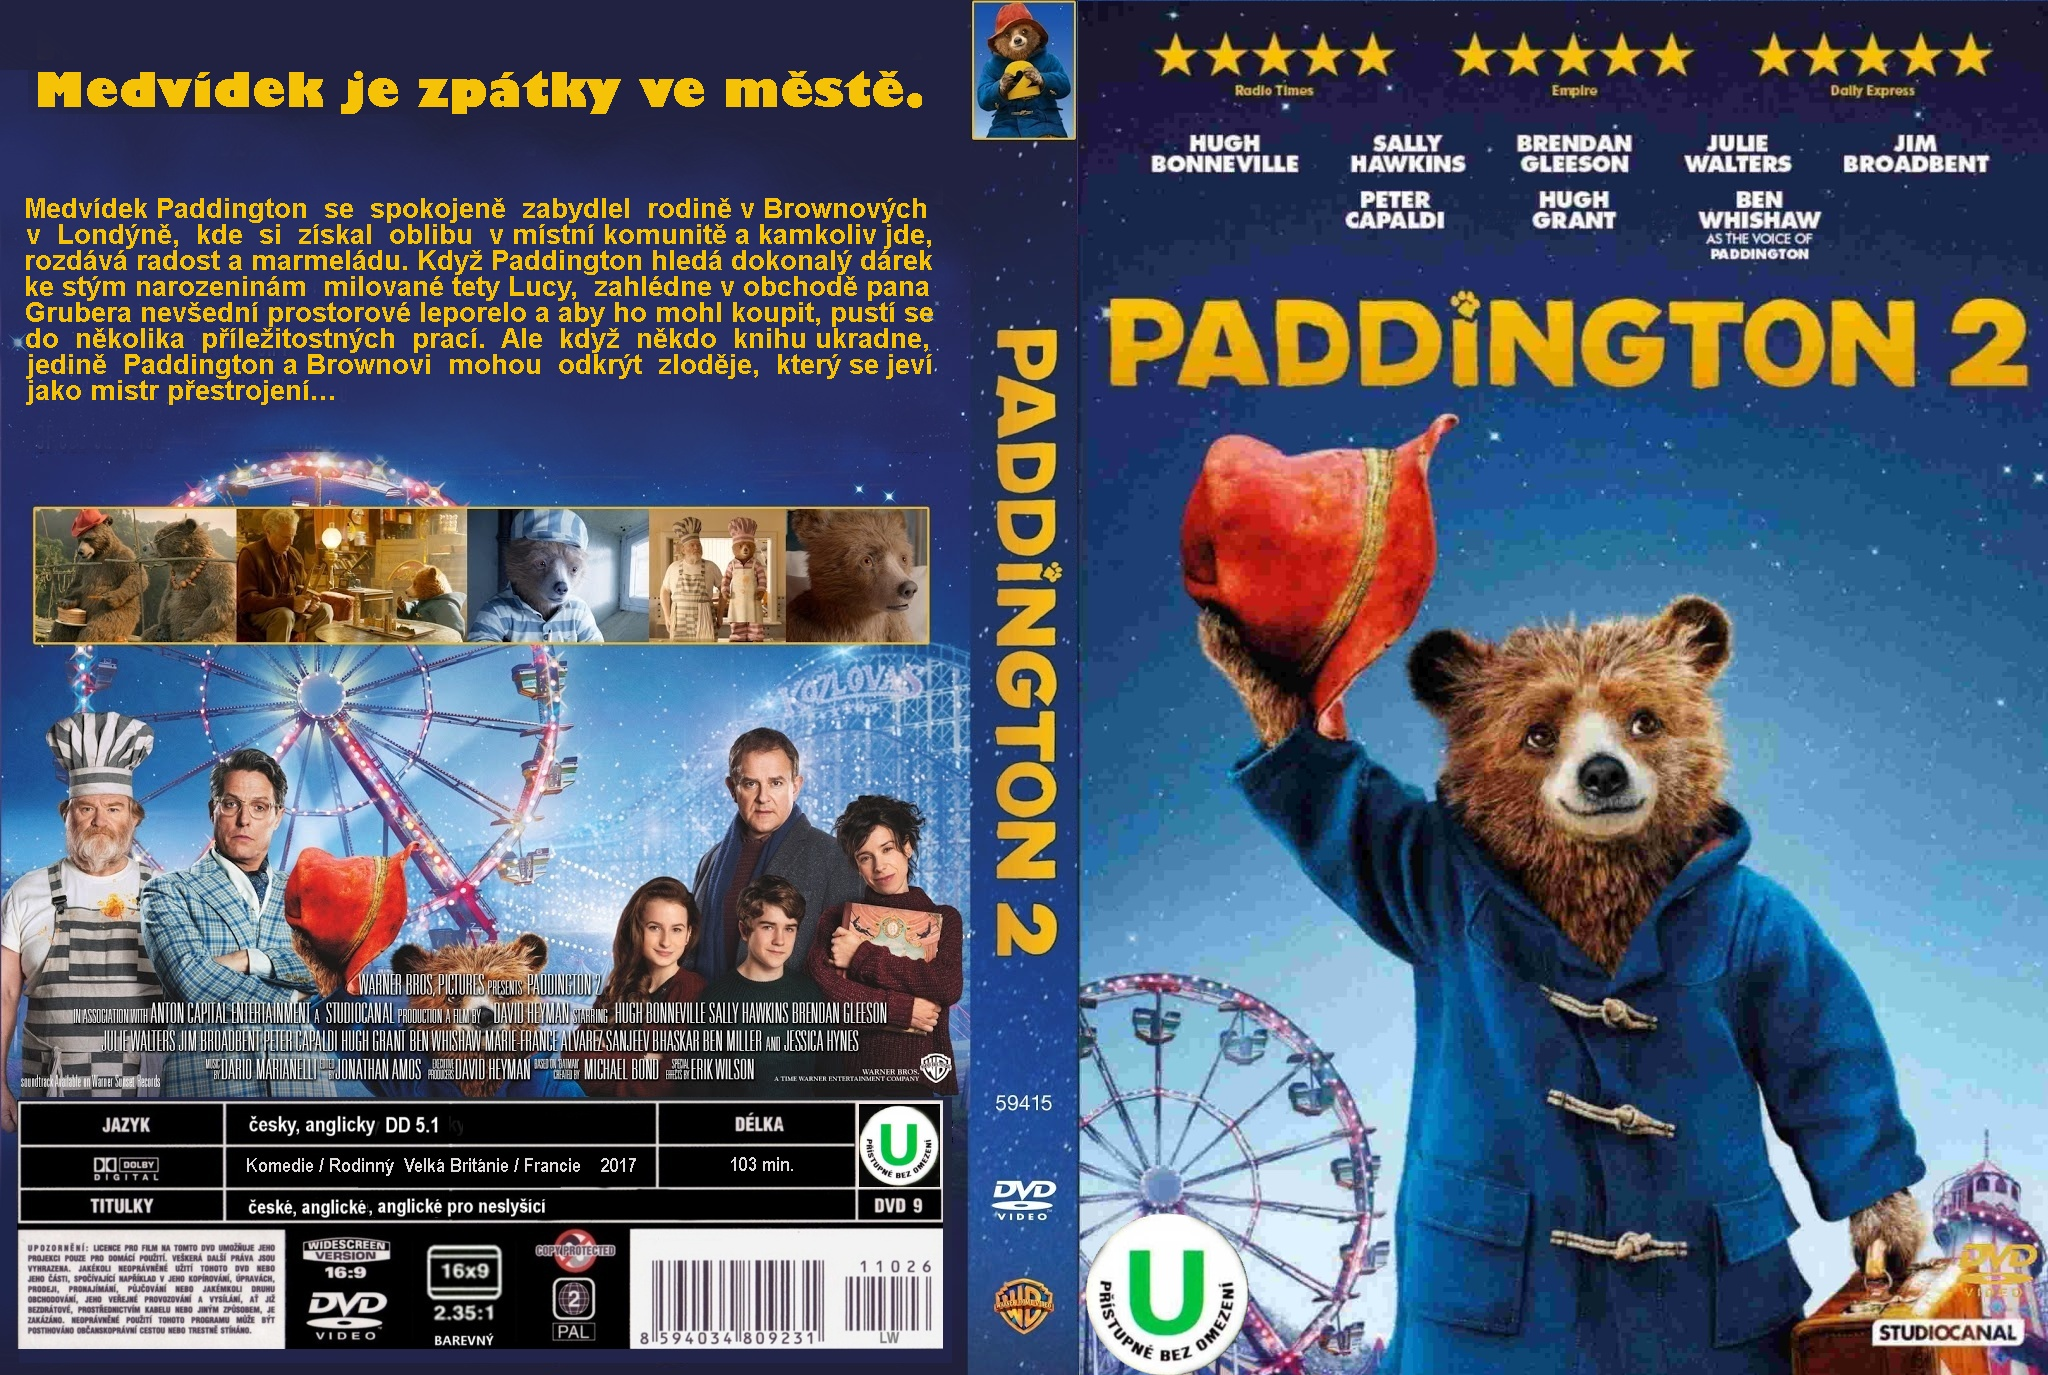 Covers Box Sk Paddington 2 2017 High Quality Dvd Blueray Movie